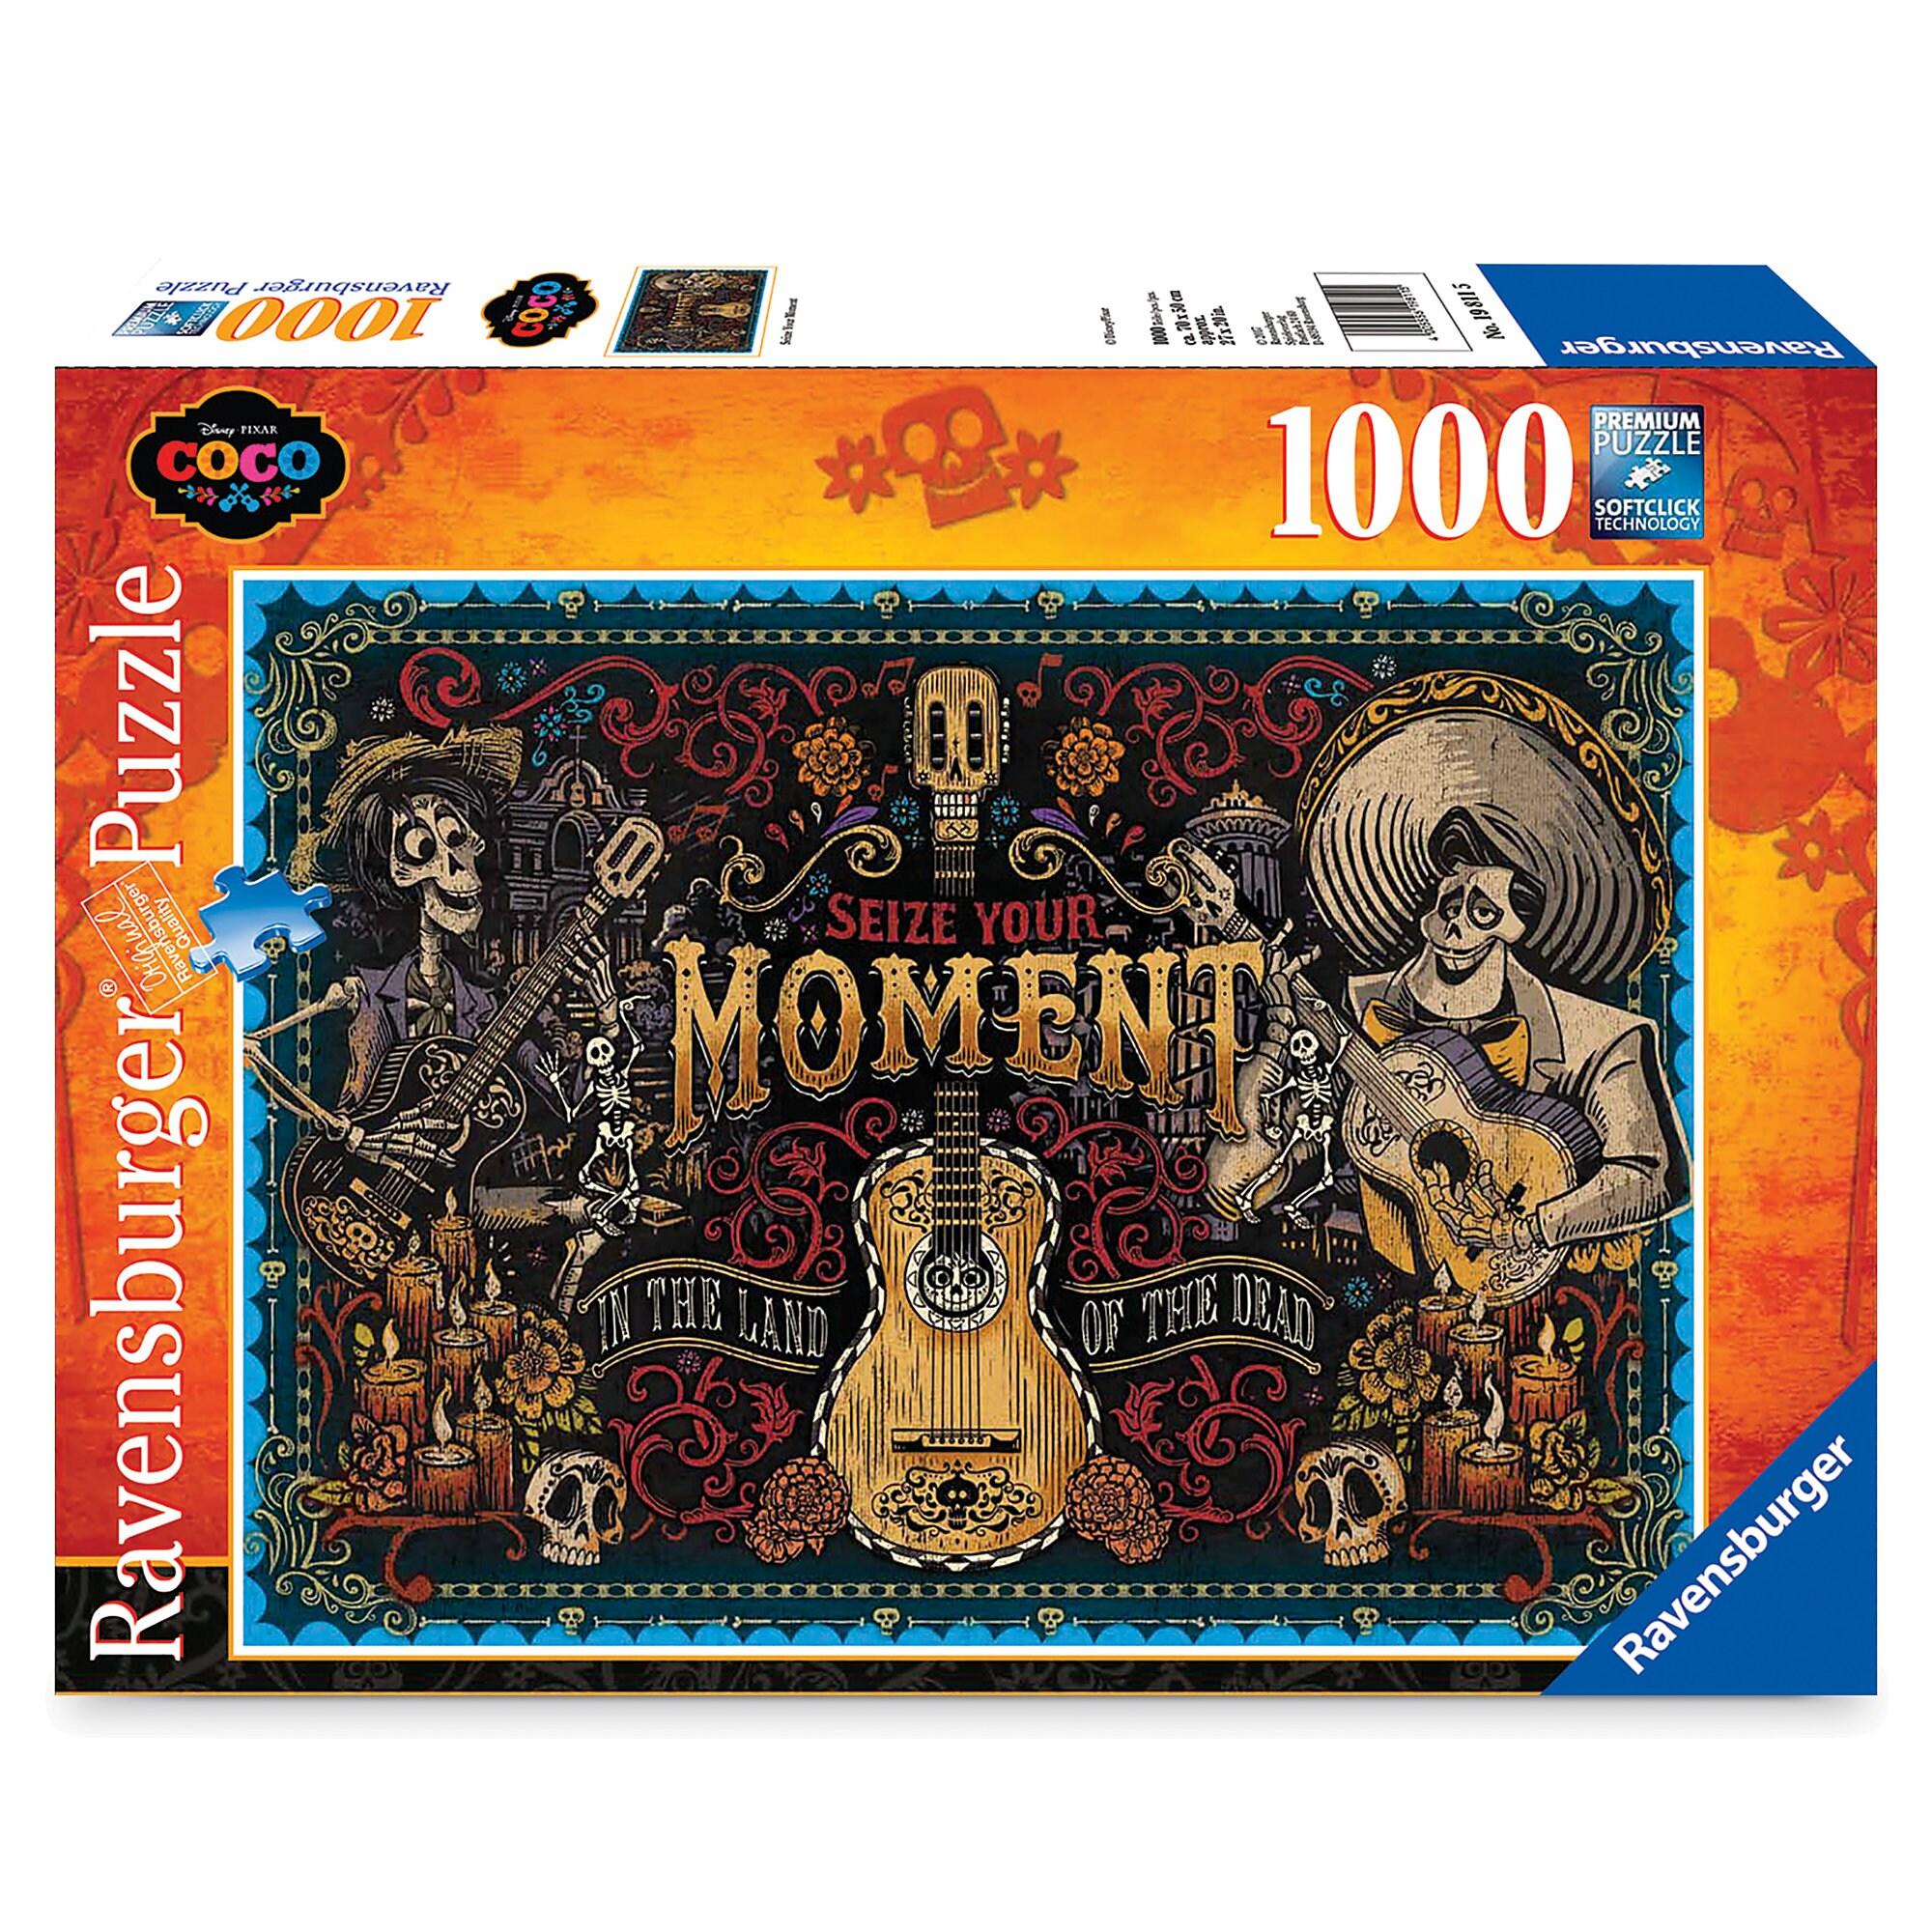 Coco ''Seize Your Moment'' Puzzle - Ravensburger